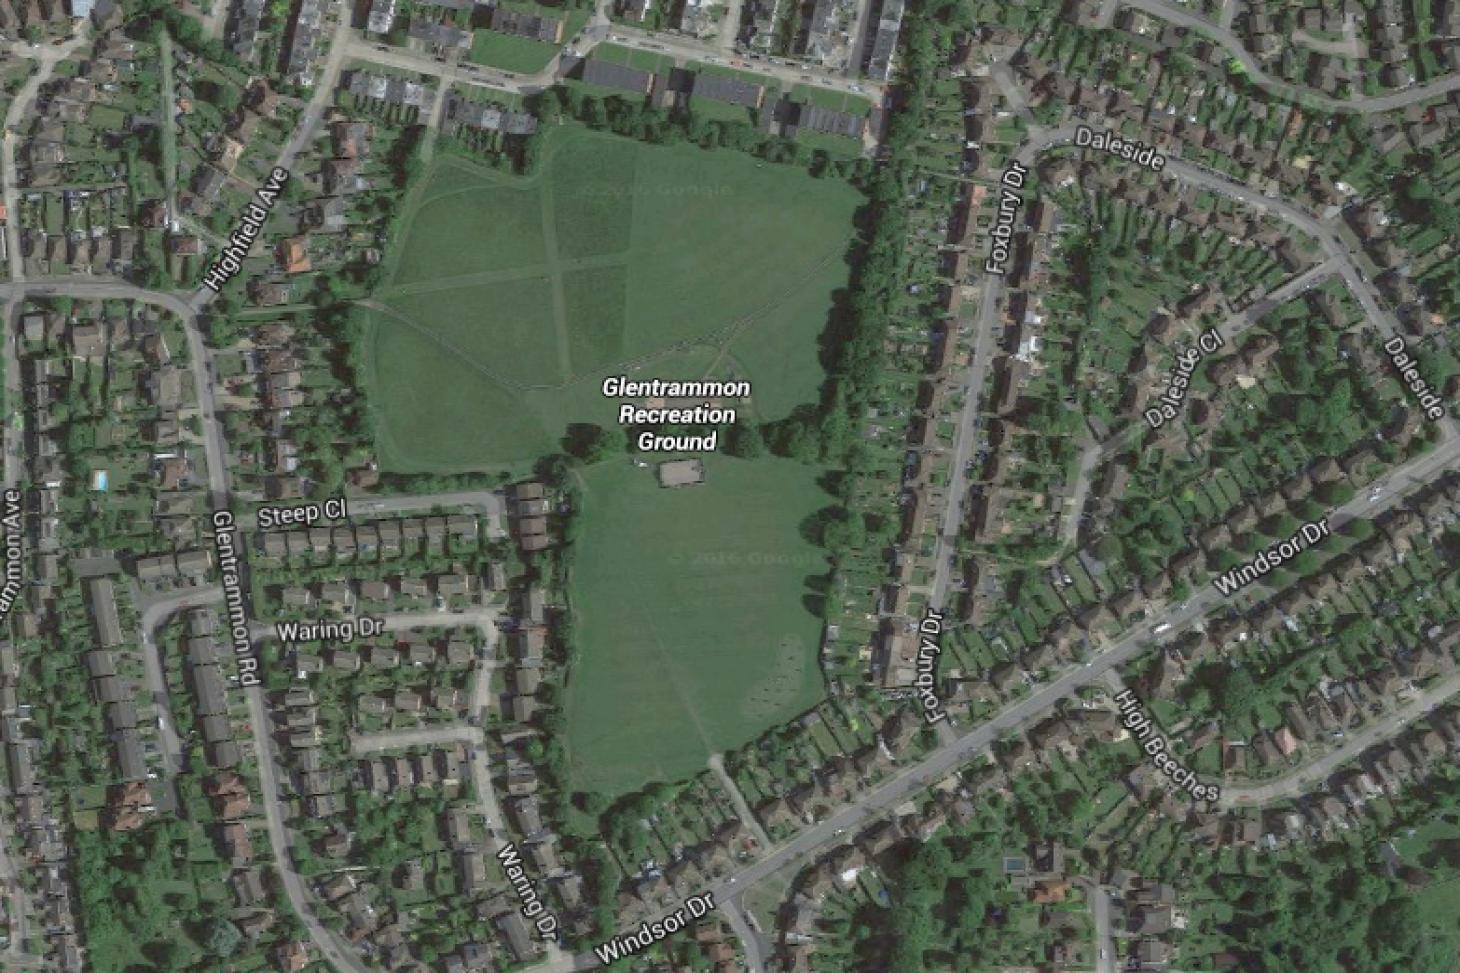 Glentrammon Recreation Ground 11 a side | Grass football pitch